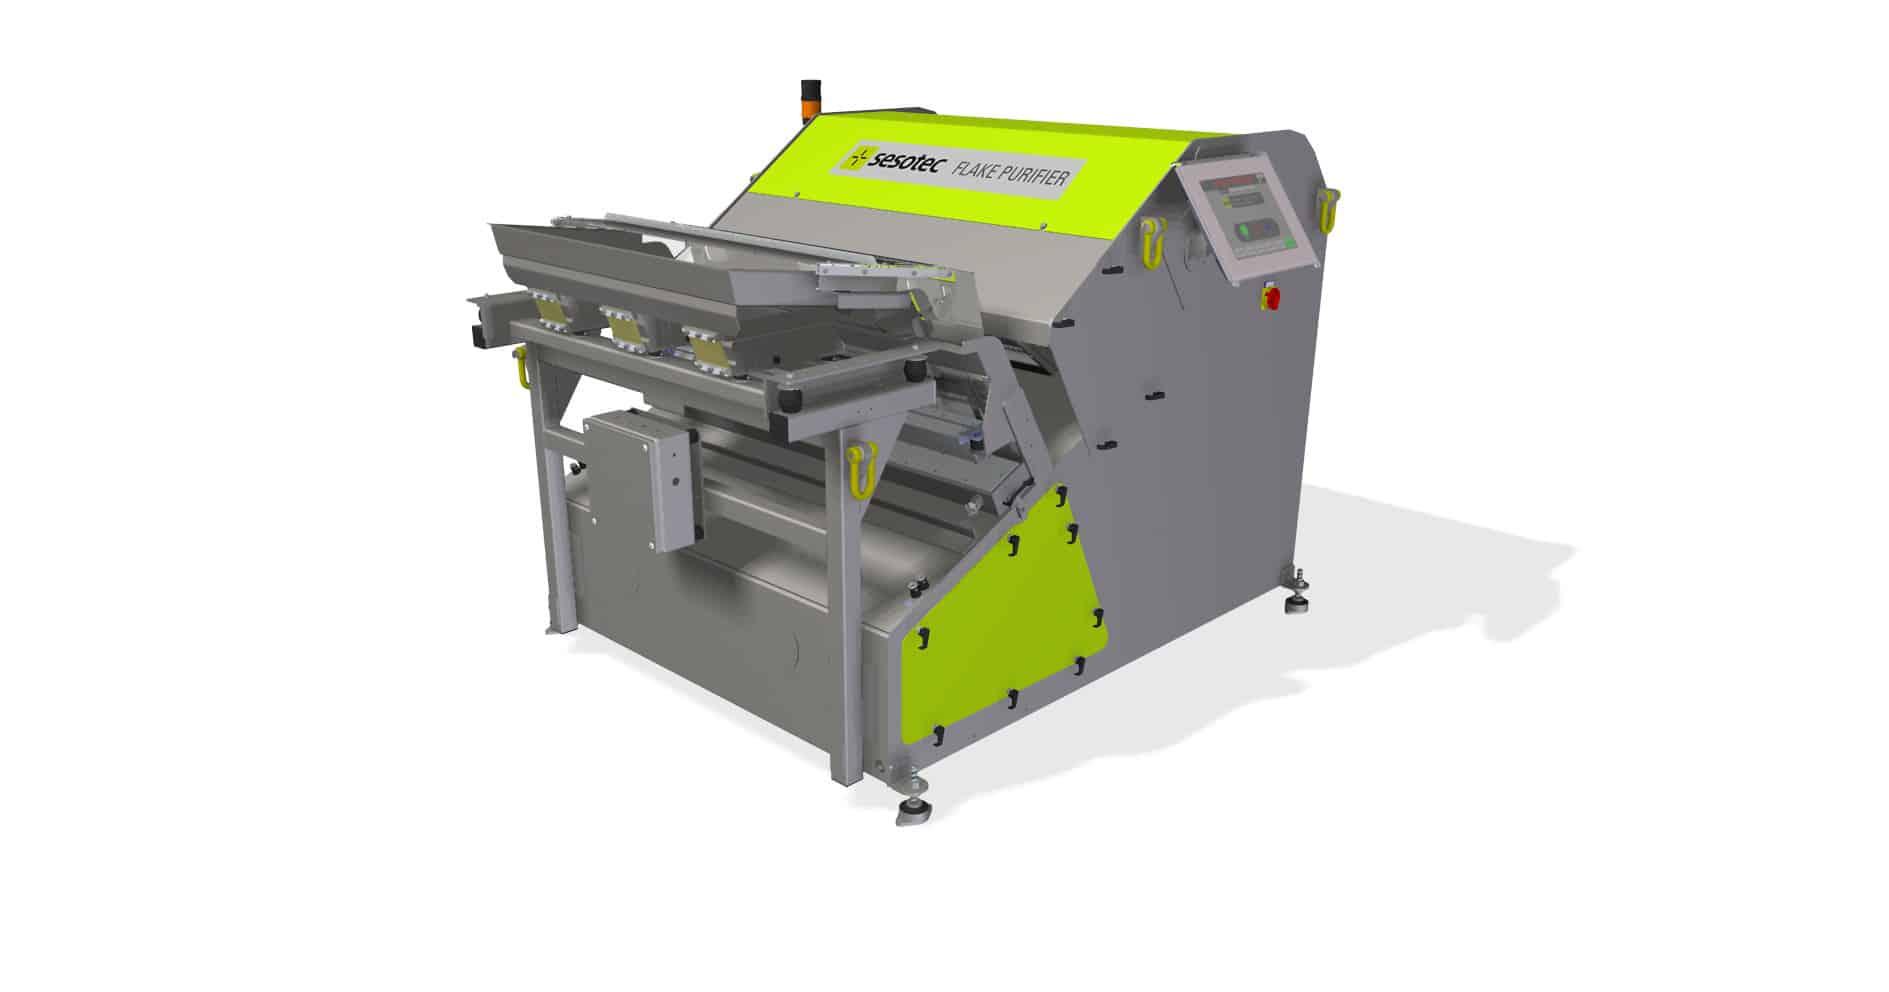 Flake-purifier-high-tech-sorting-system-sesotec